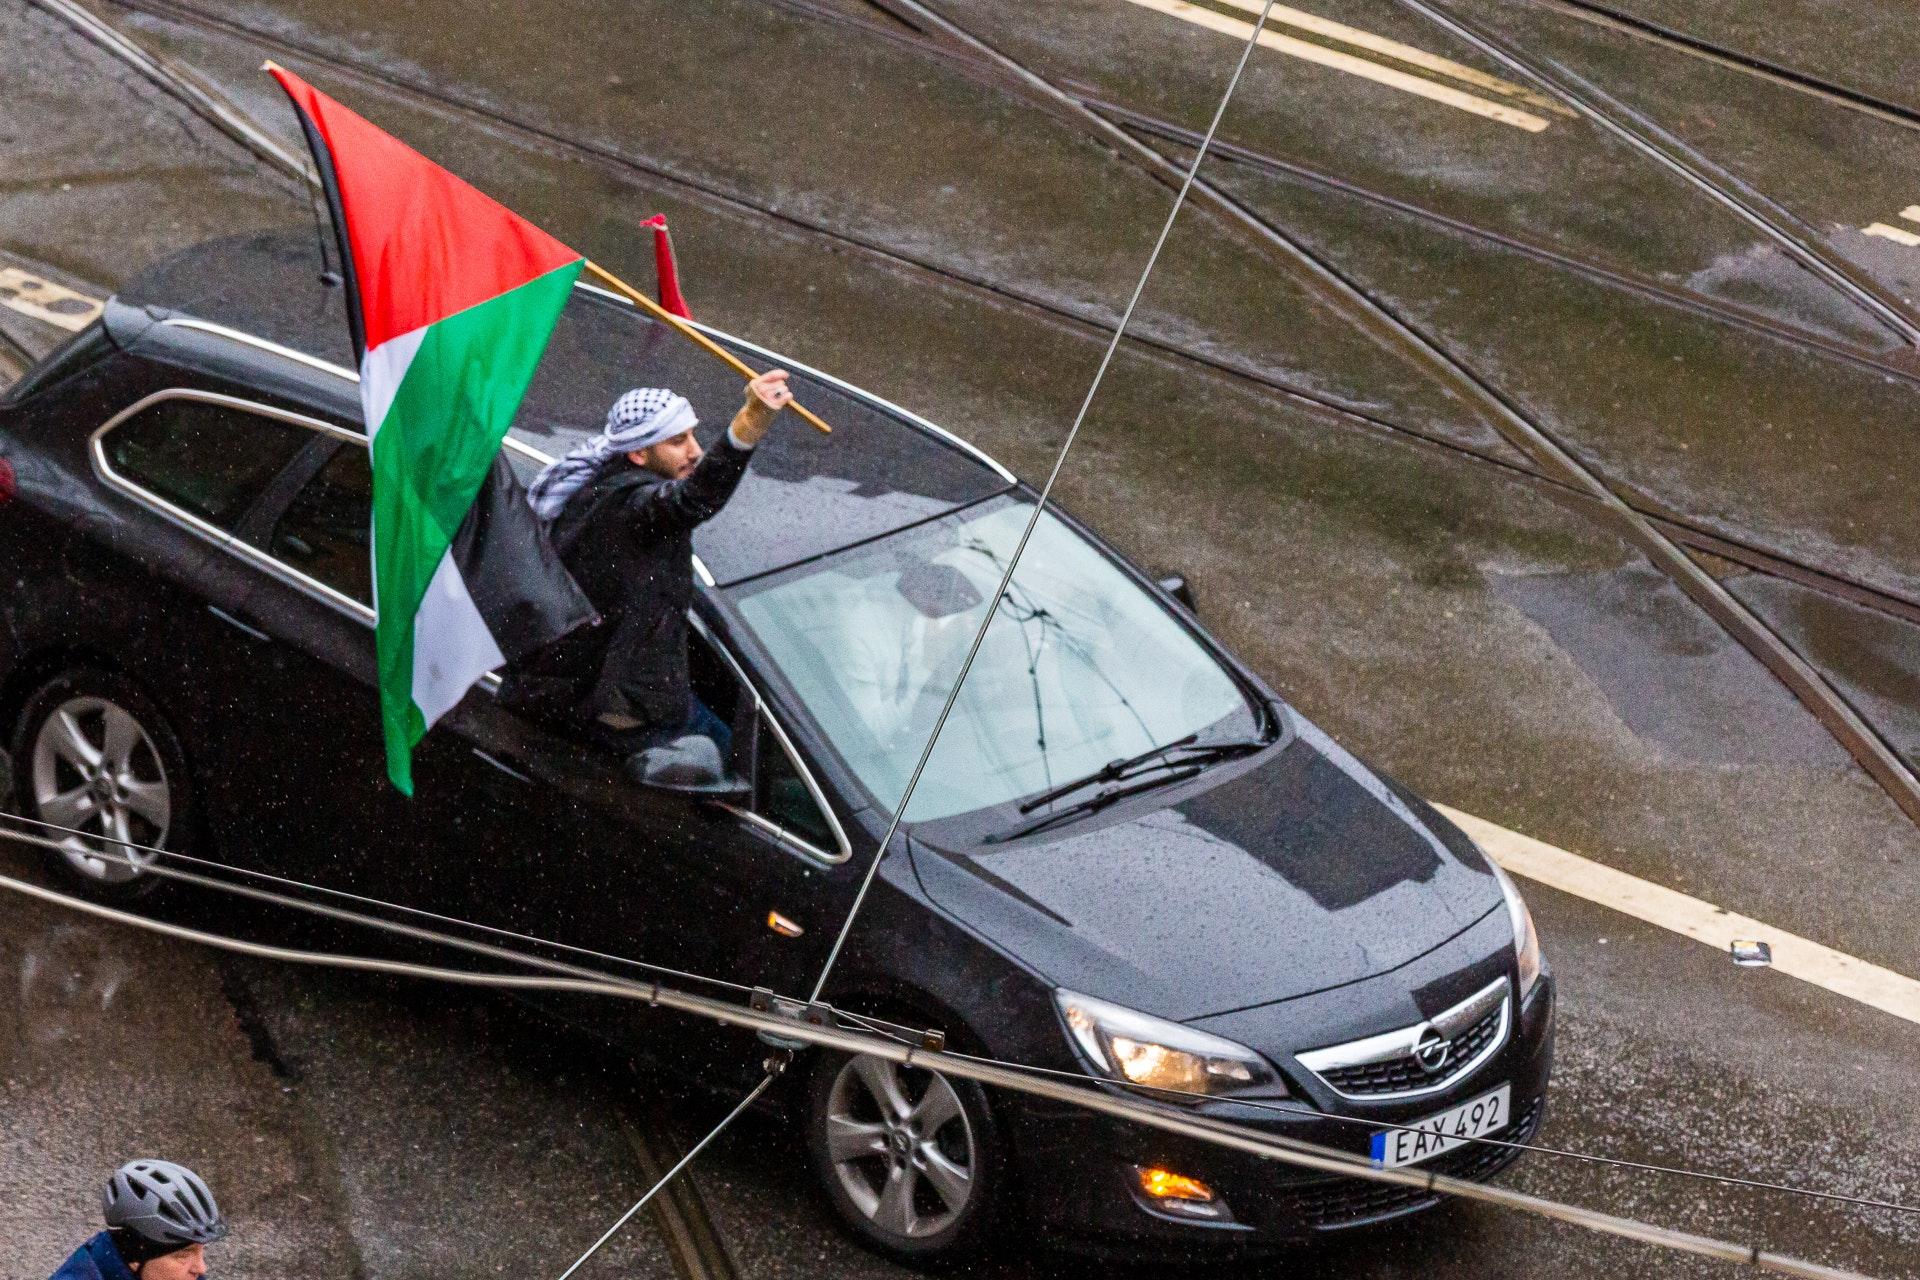 Protestor rides the windowsill as the car follows the convoy